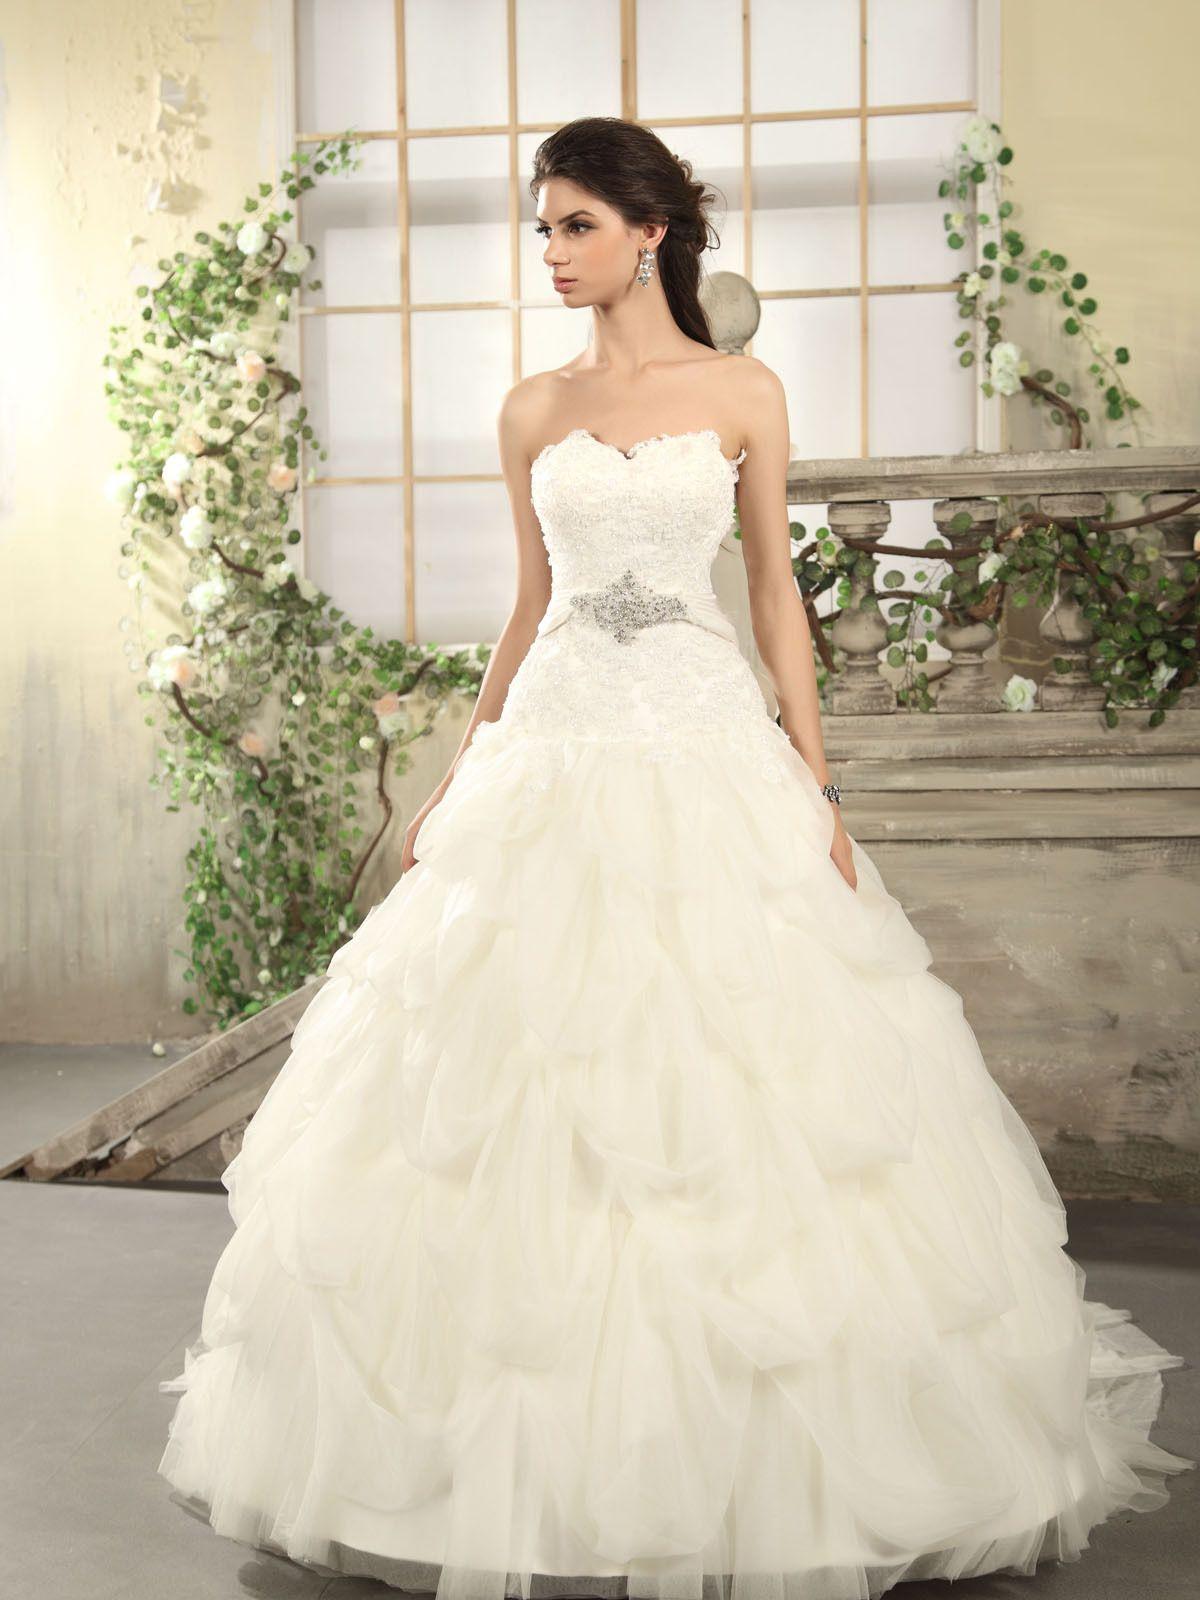 Natural wedding dresses  Such a pretty dress  One Day  Pinterest  Wedding dress